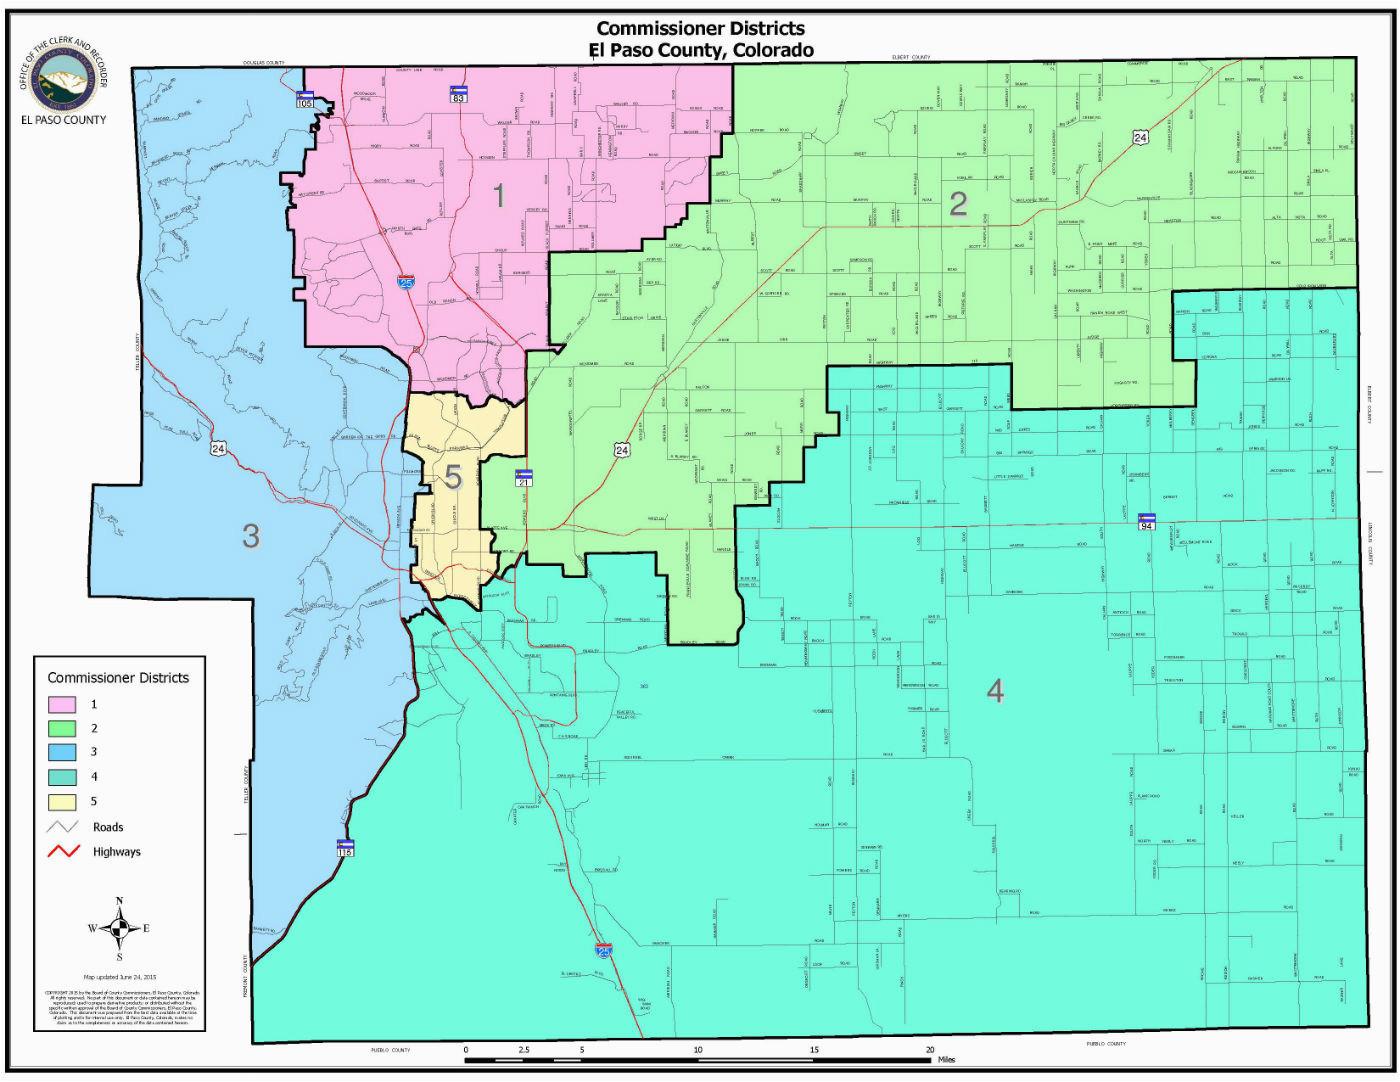 Colorado Springs Zip Code Map Pdf Board Of County Commissioners El Paso County Board Of County